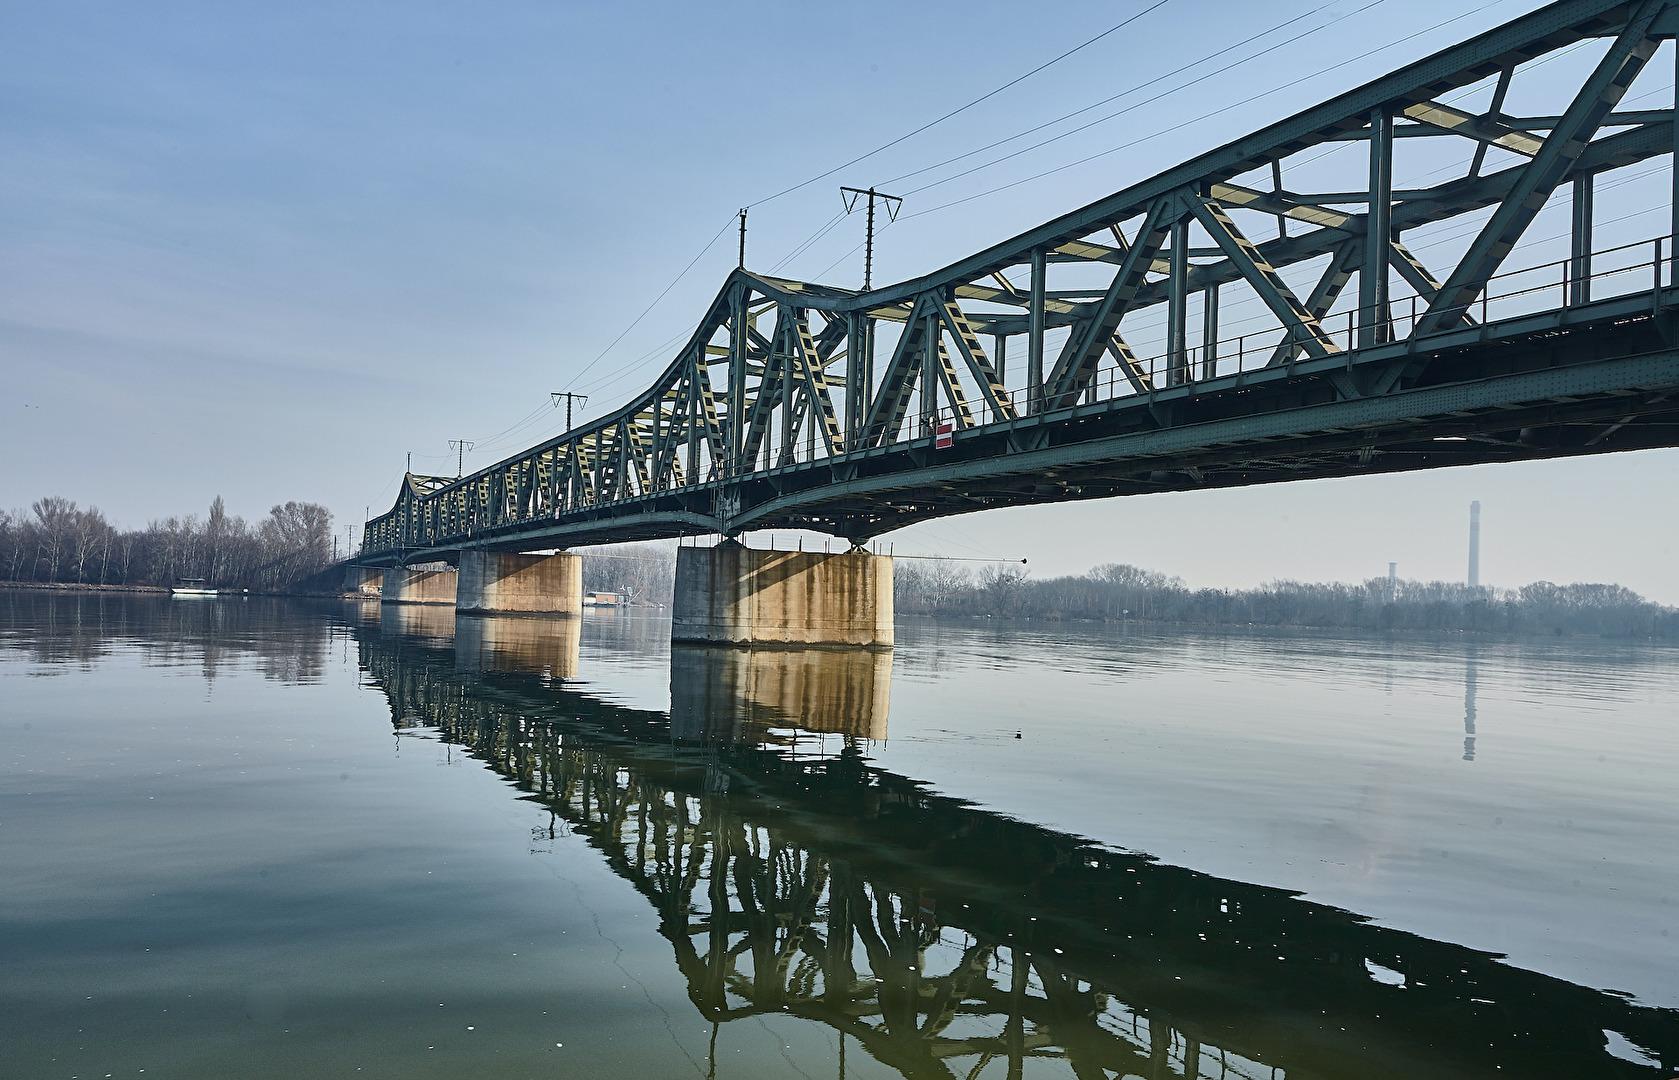 Eisenbahnbrücke über die Donau